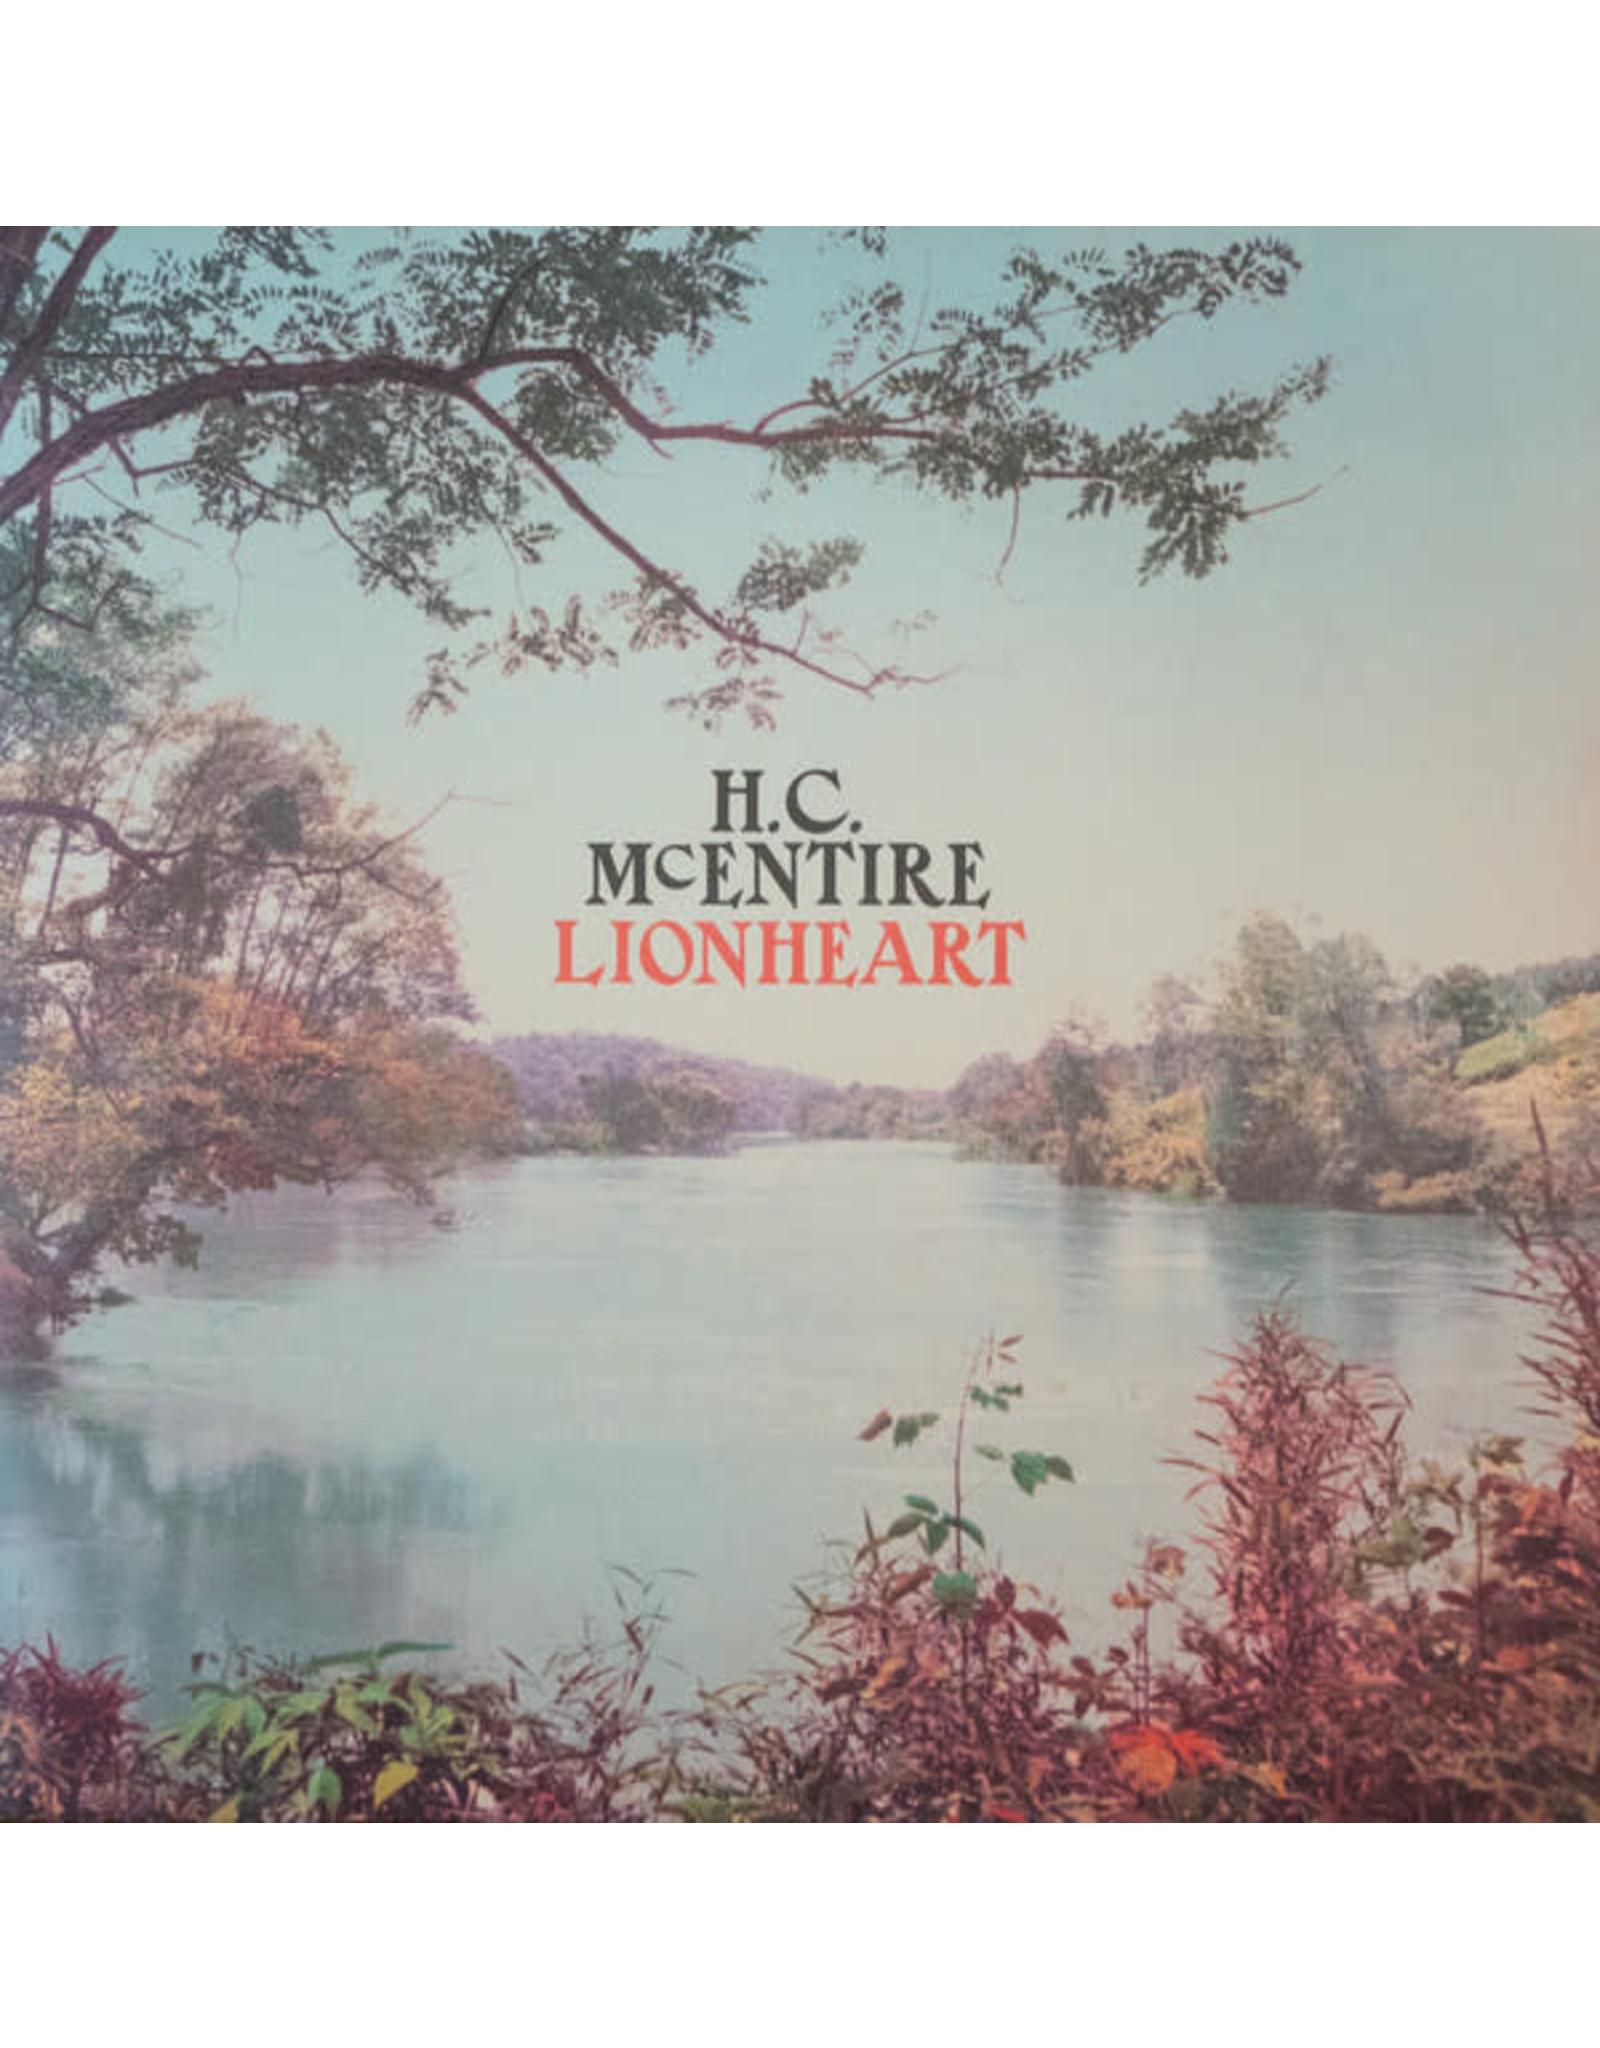 McEntire, H.C. - Lionheart (White Vinyl) LP